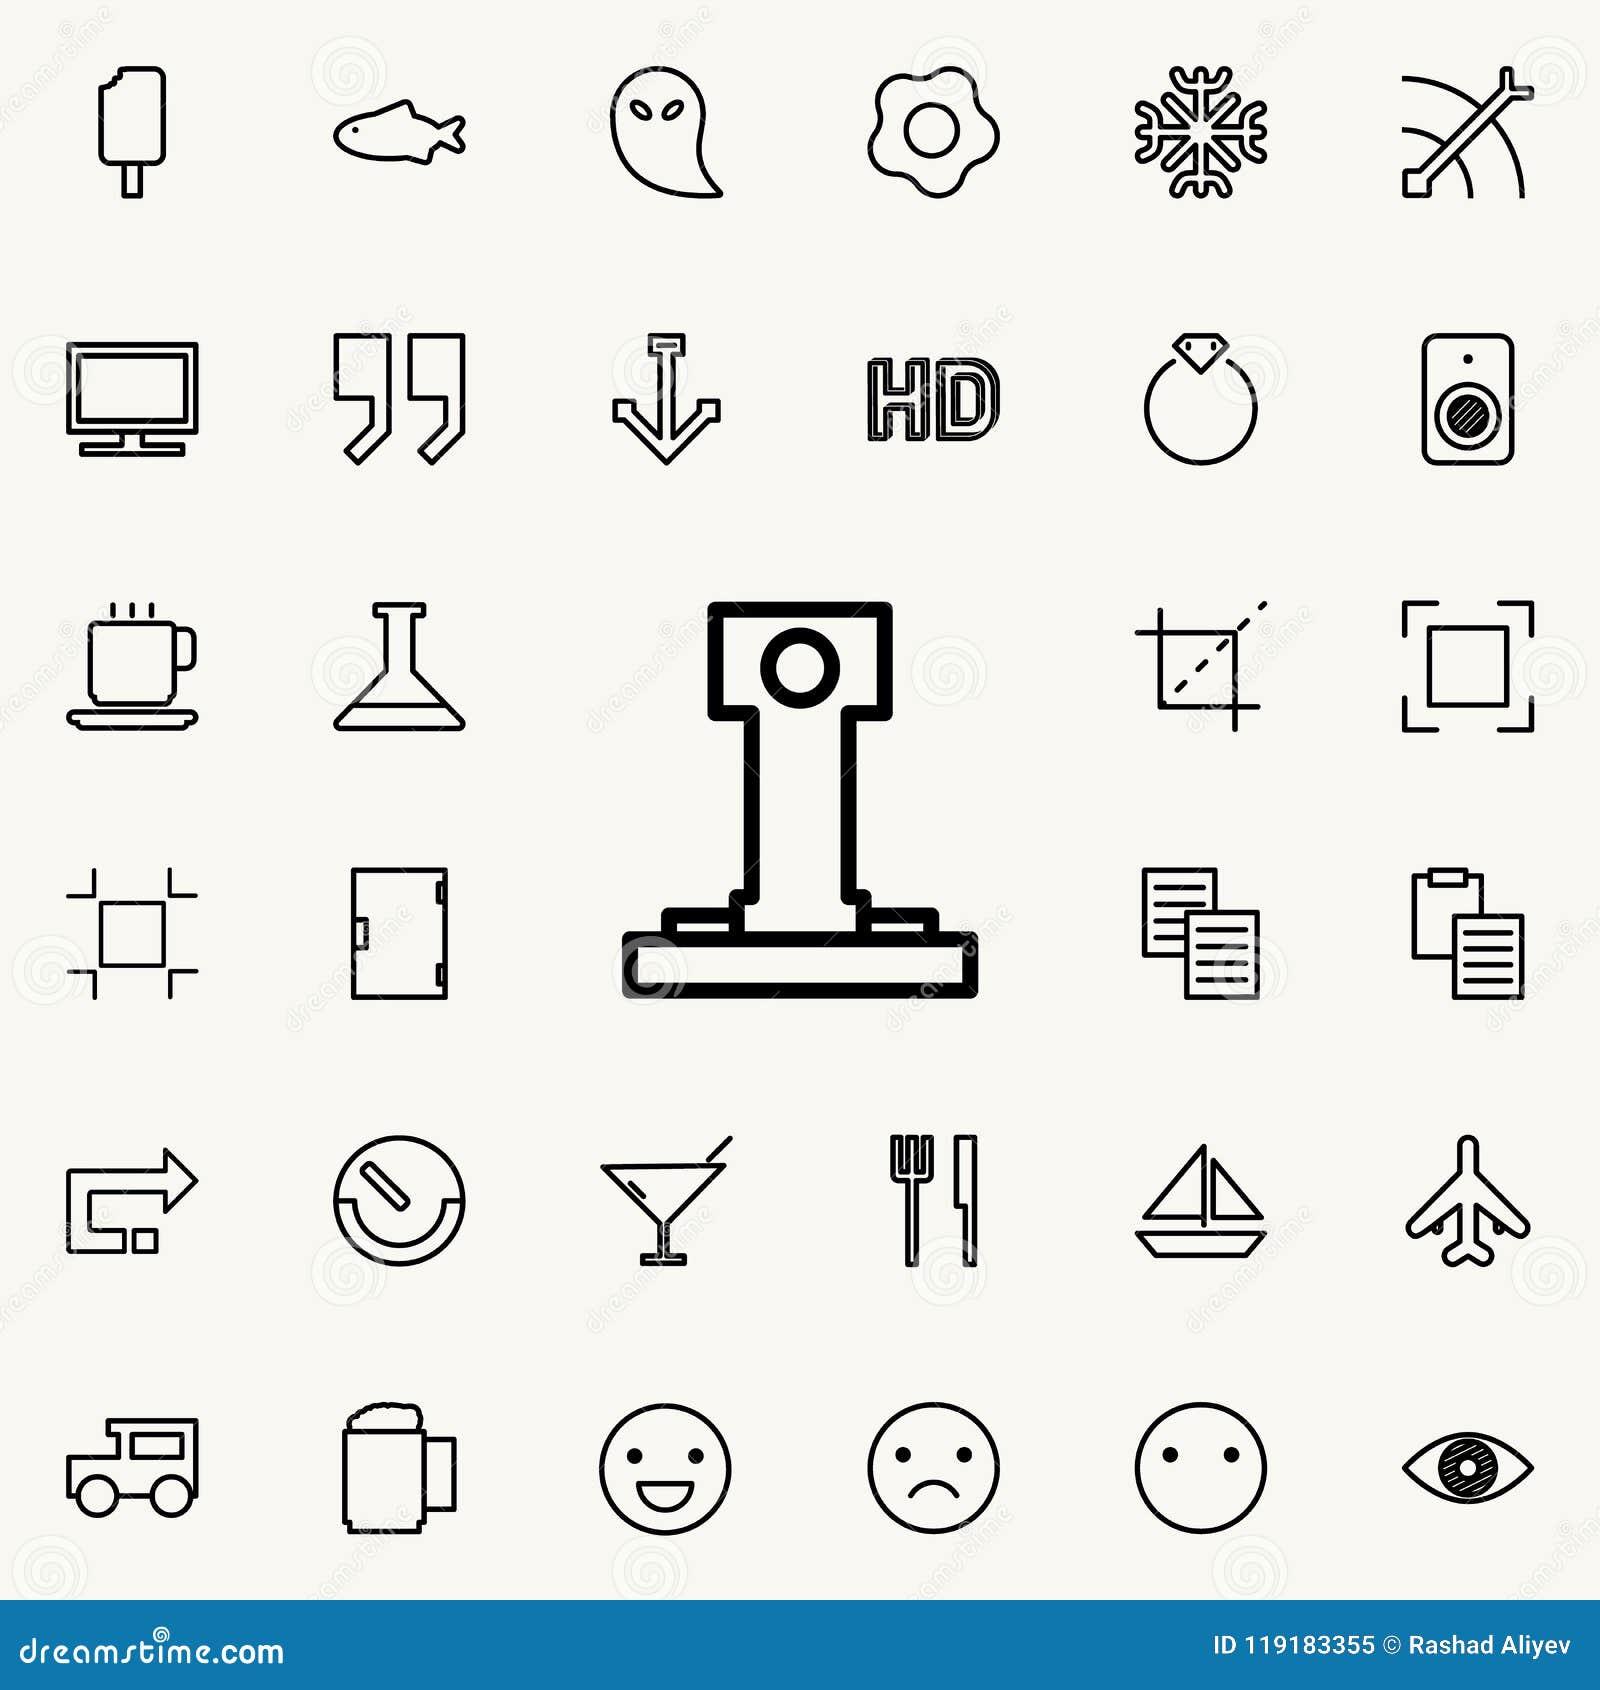 Mini Lighthouse Outline Icon Detailed Set Of Minimalistic Line Icons Premium Graphic Design